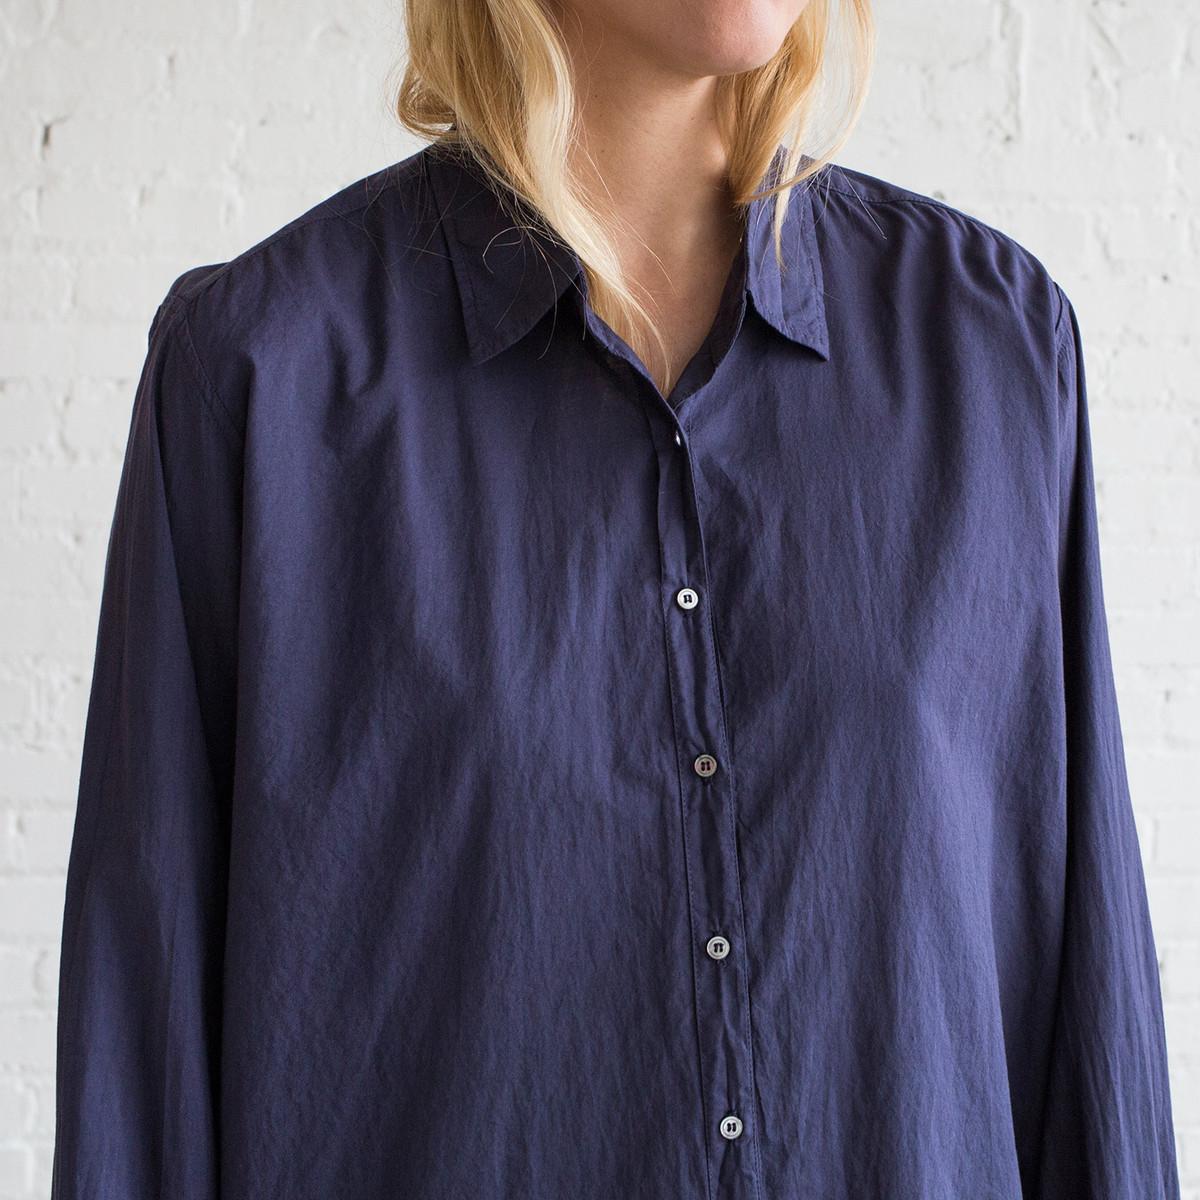 Xirena Beau Shirt Midnight Blue Garmentory